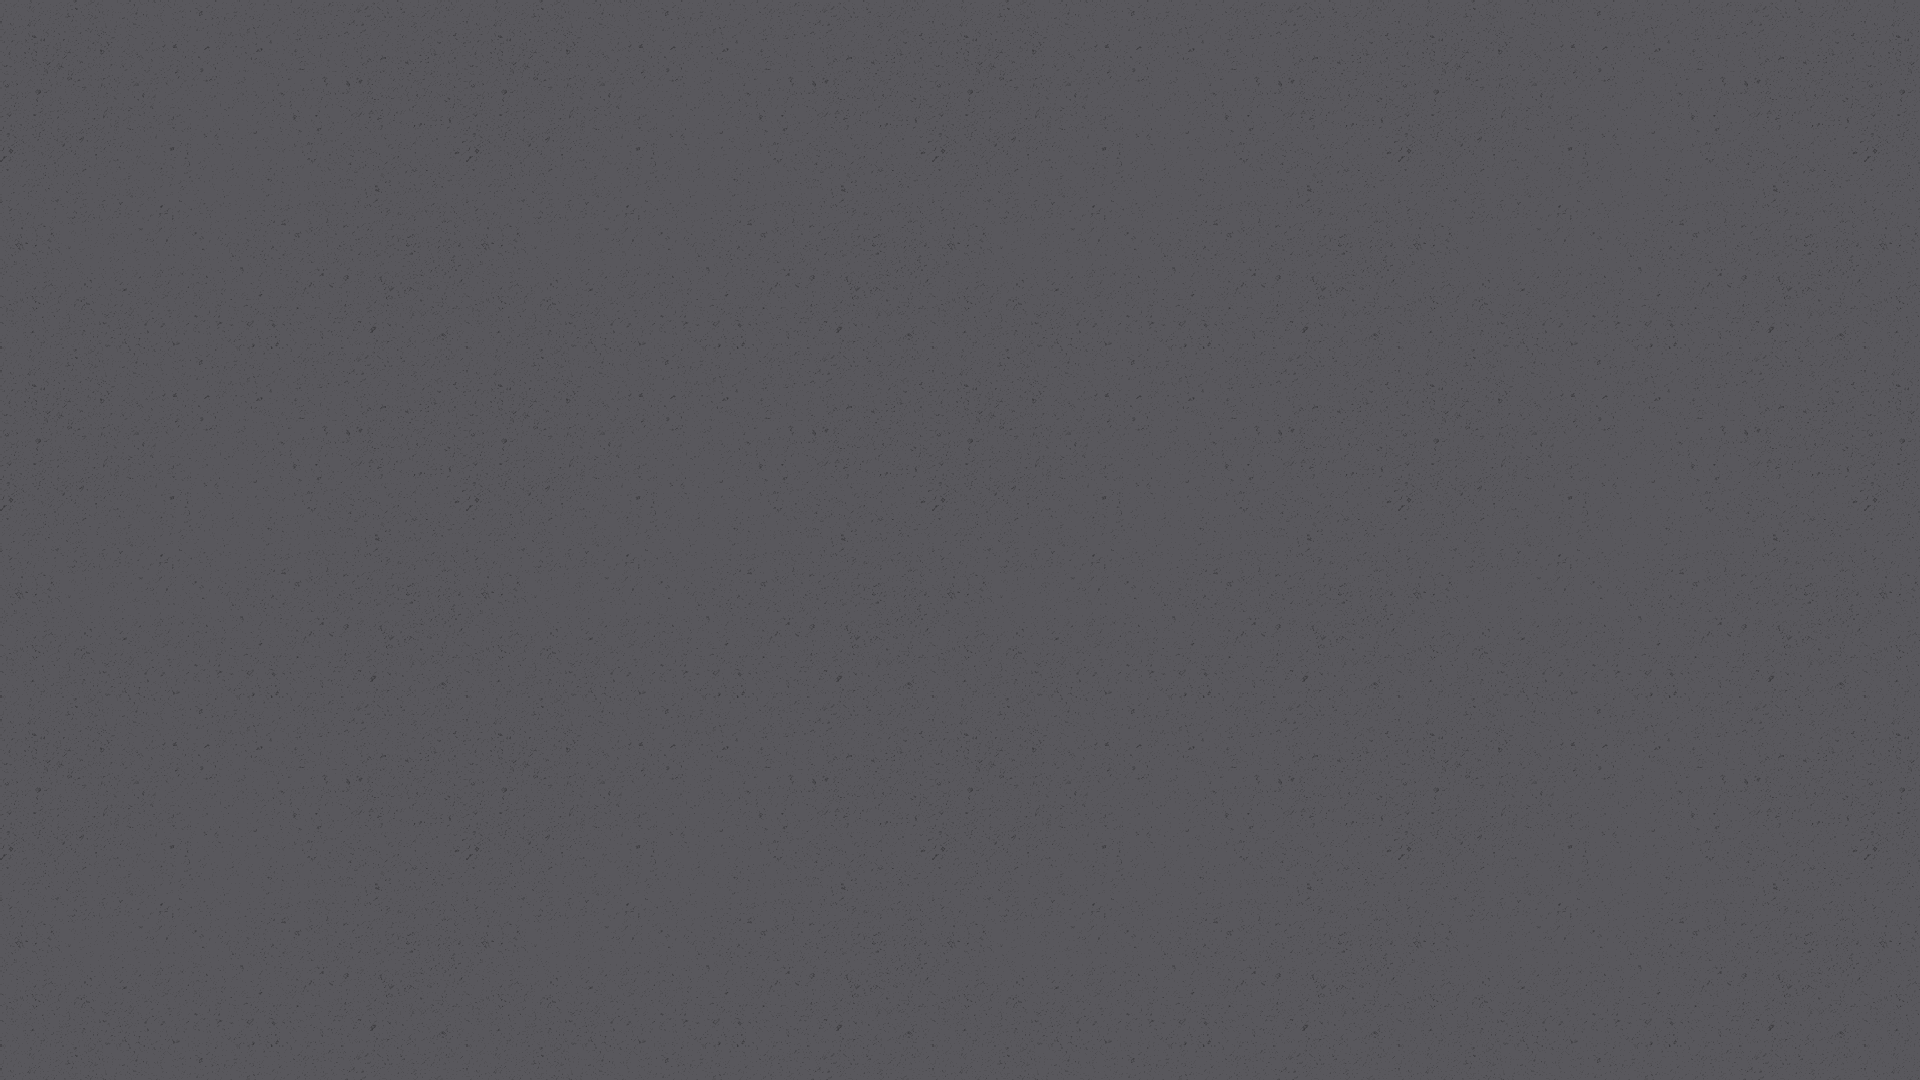 asfalt-dark-texture